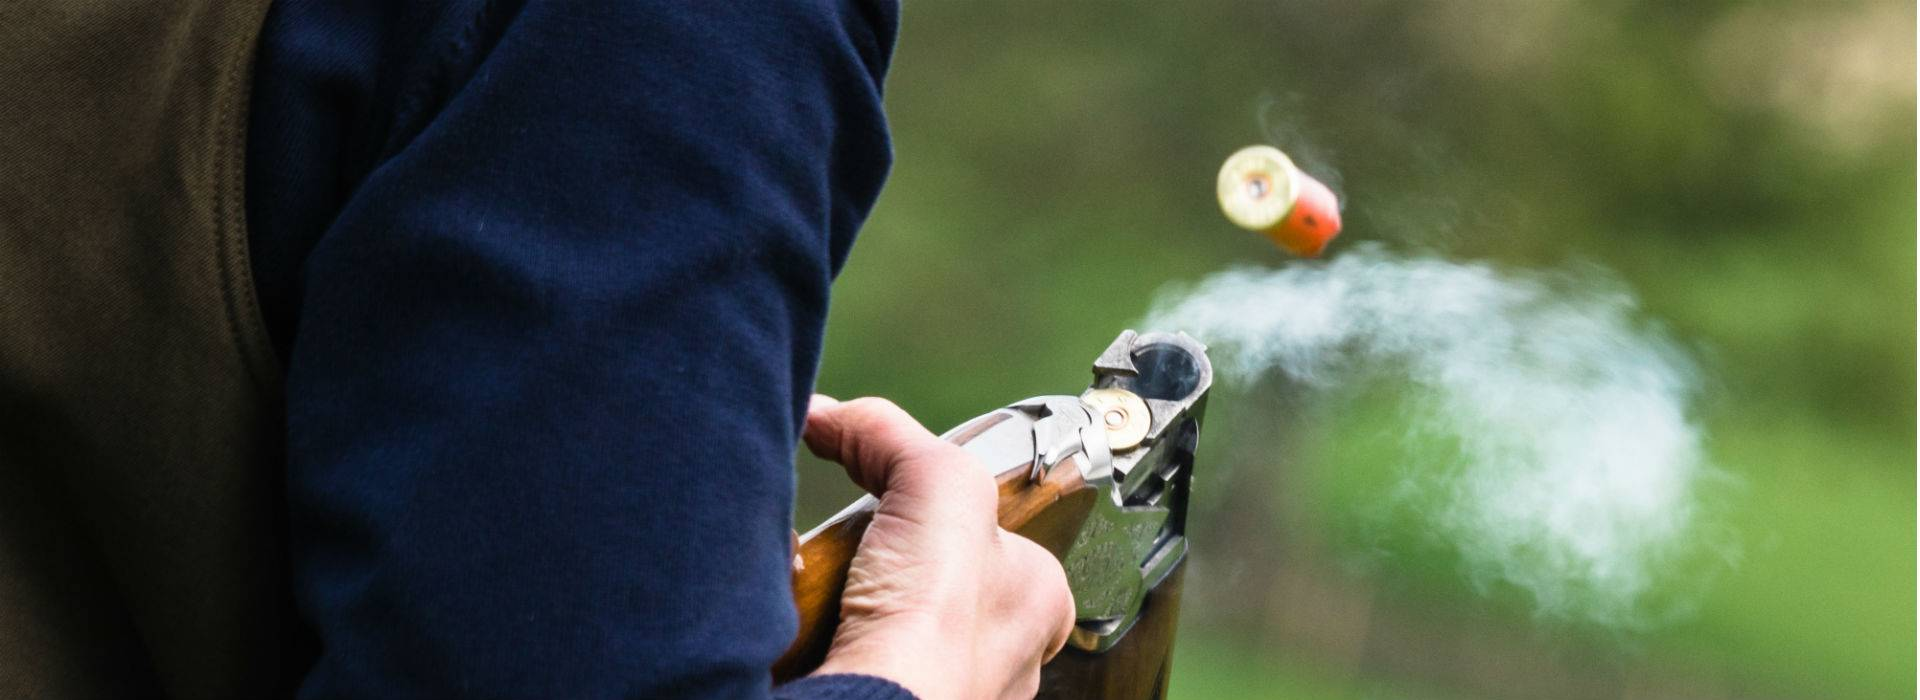 Gun Safe Blog Post